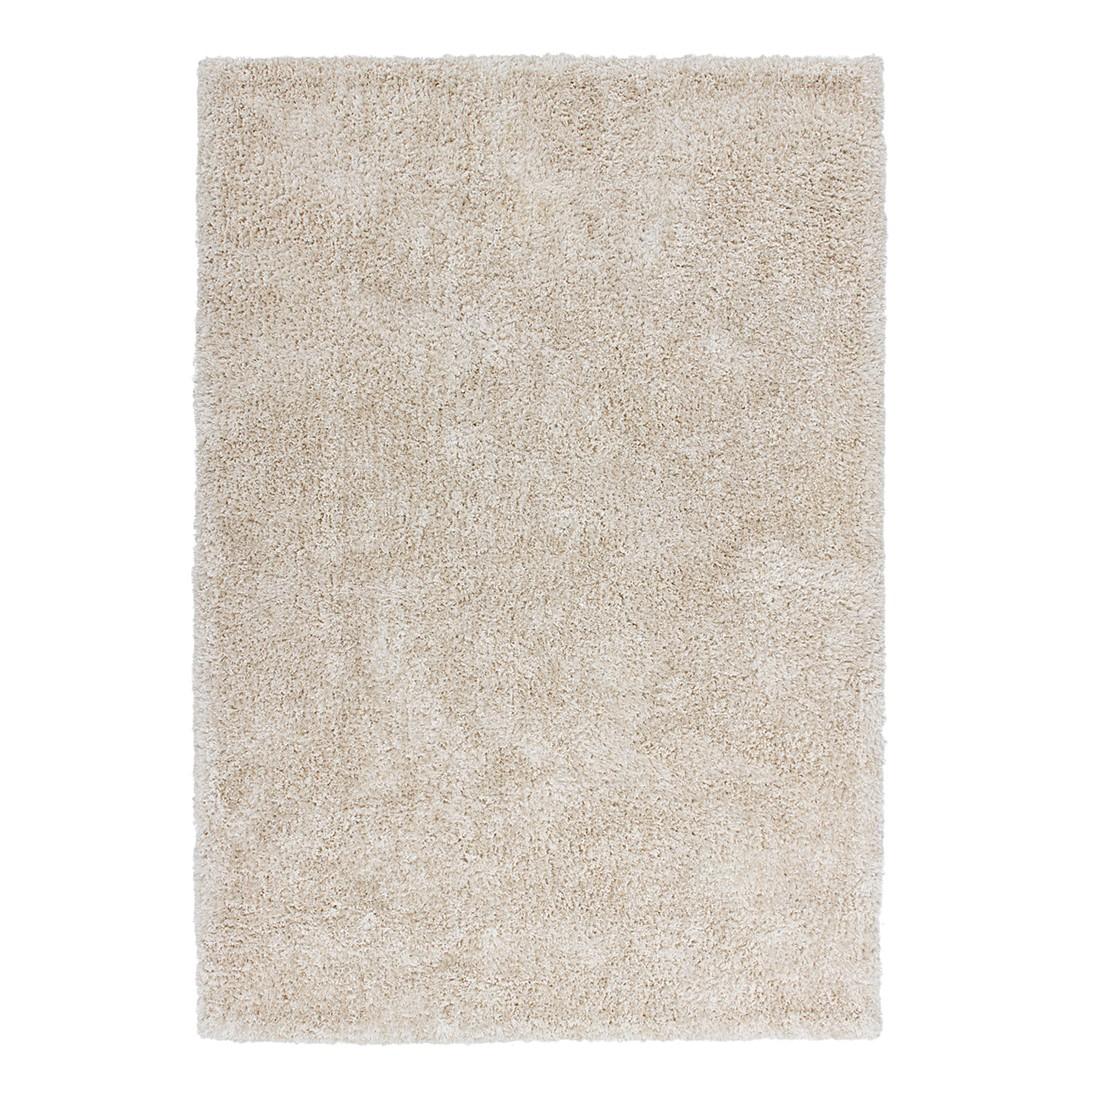 Teppich Tanzania – Tanga – Beige – 120 x 170 cm, Kayoom günstig kaufen